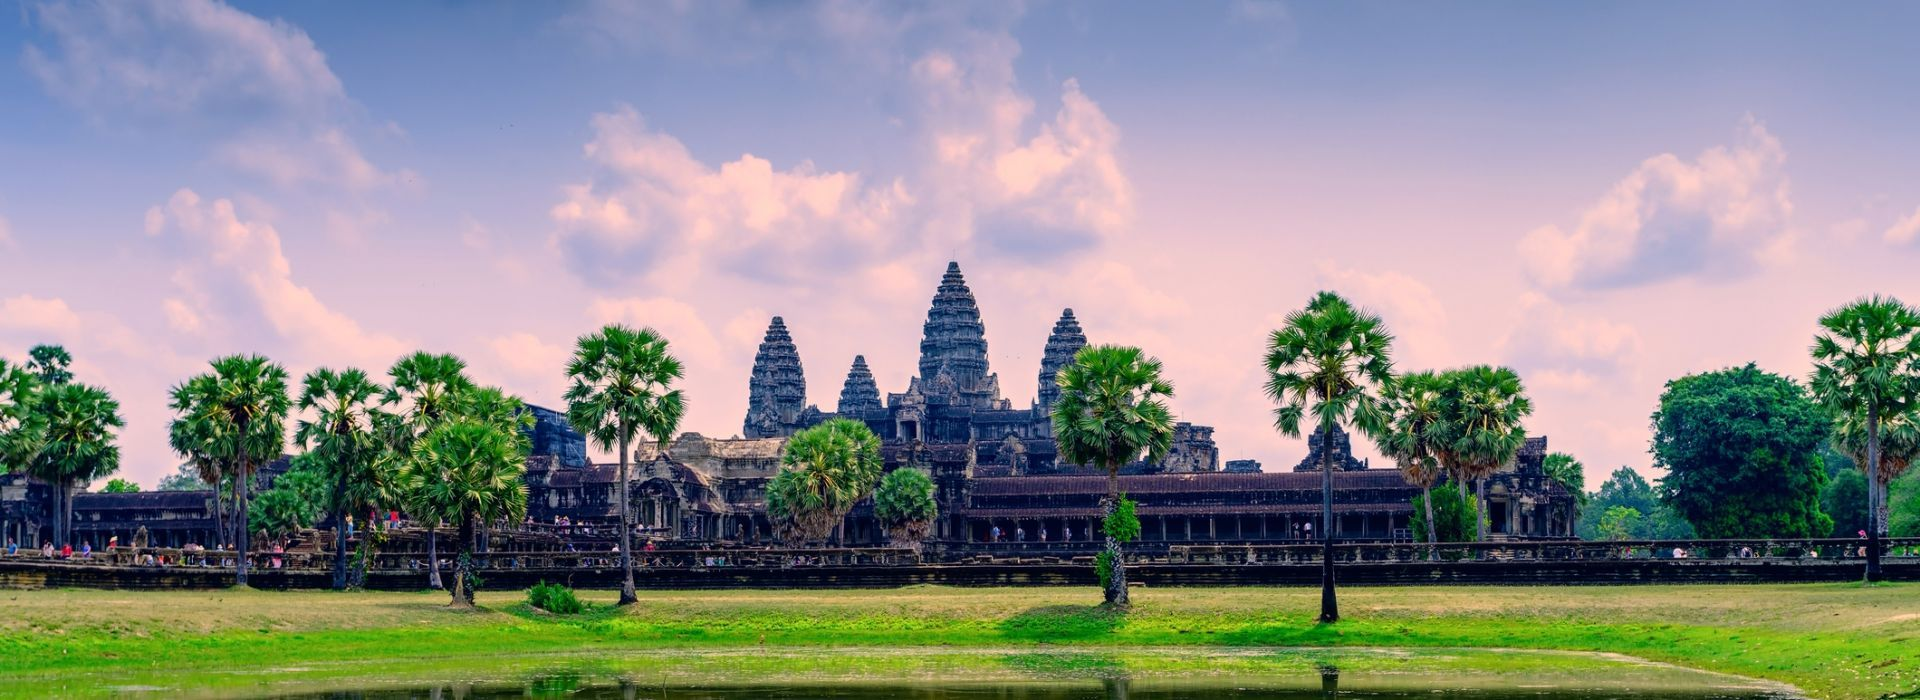 Sightseeing Tours in Kampot